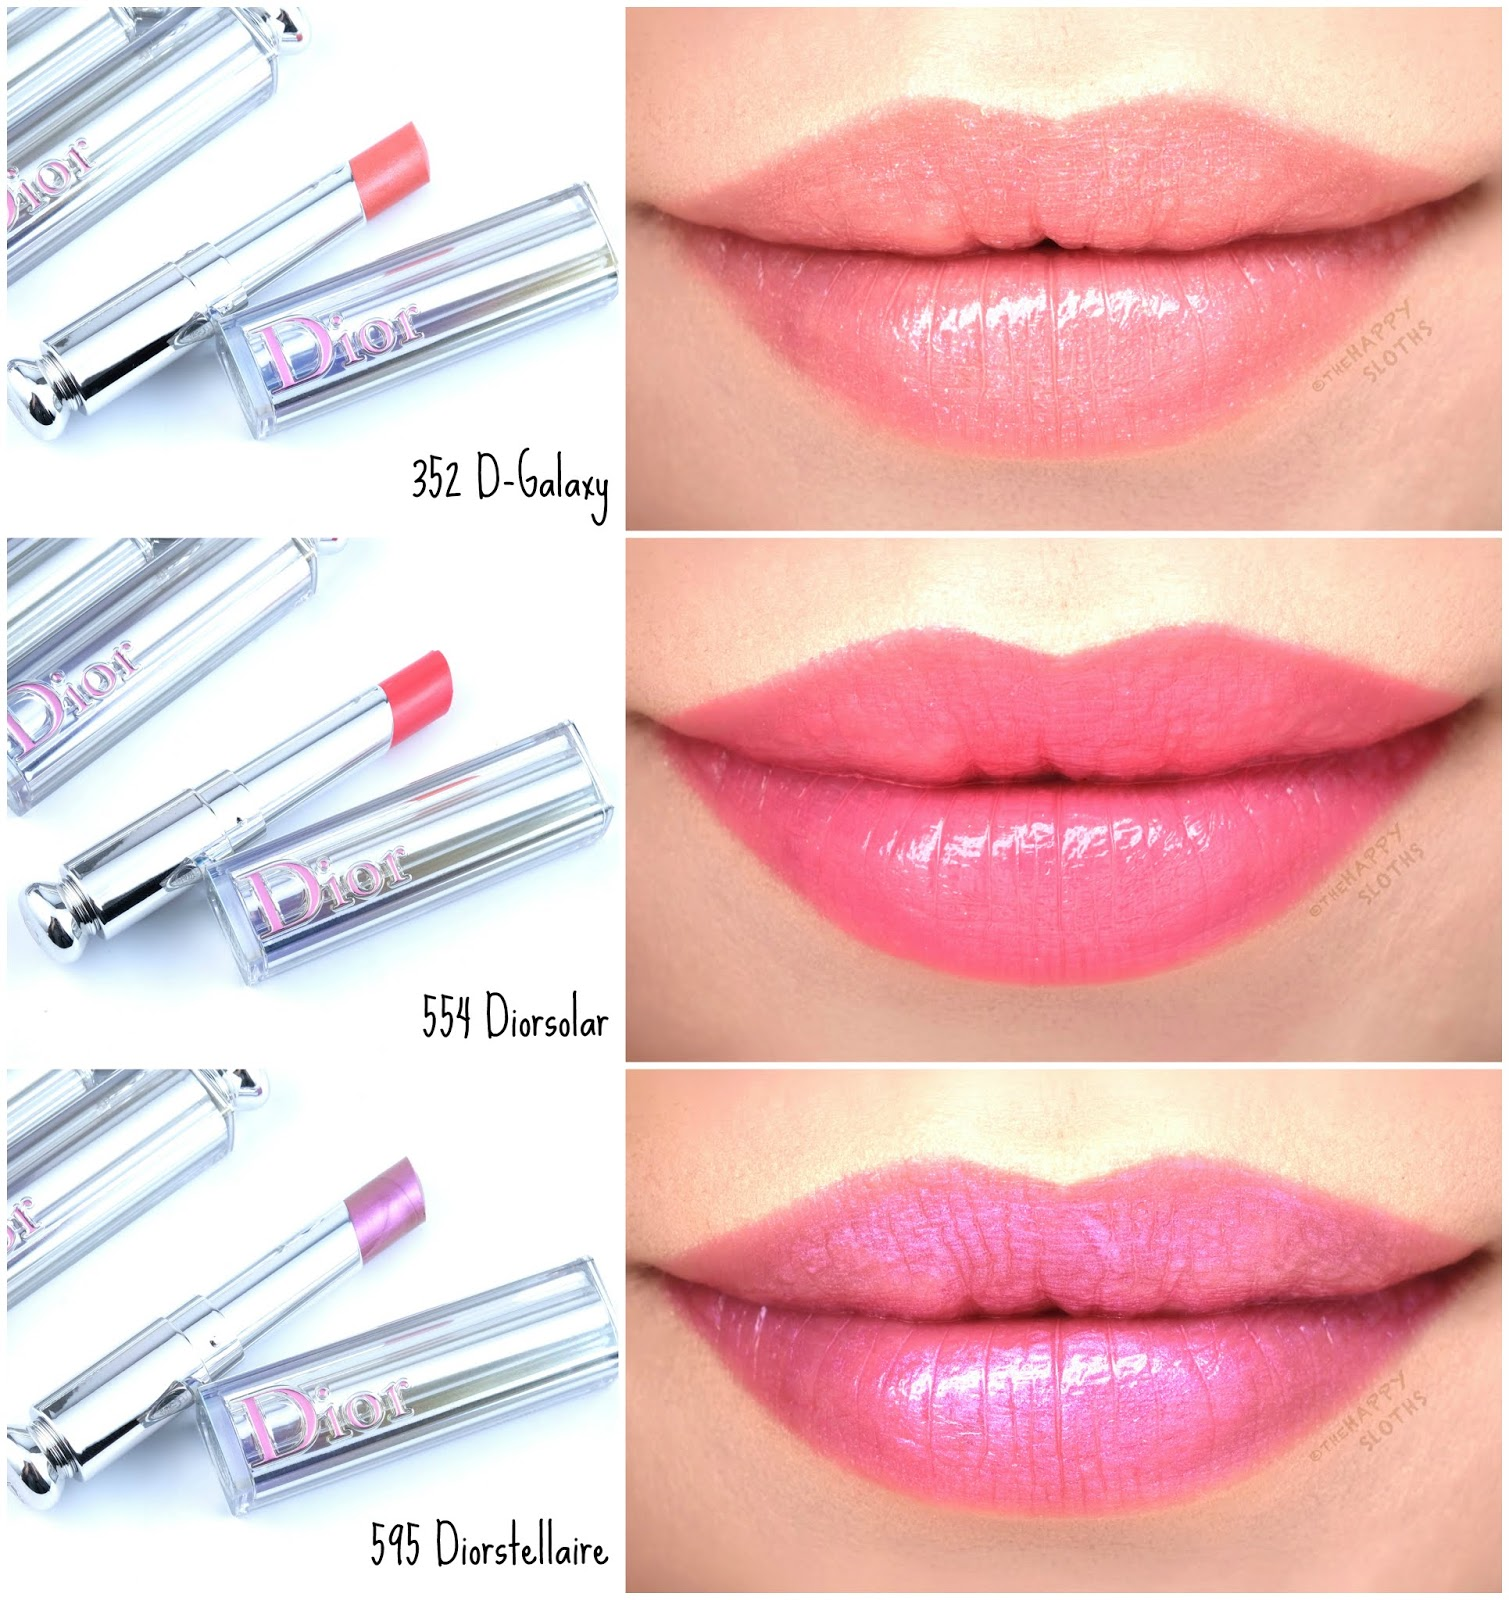 aaa21703 Dior | Dior Addict Stellar Shine Lipstick in